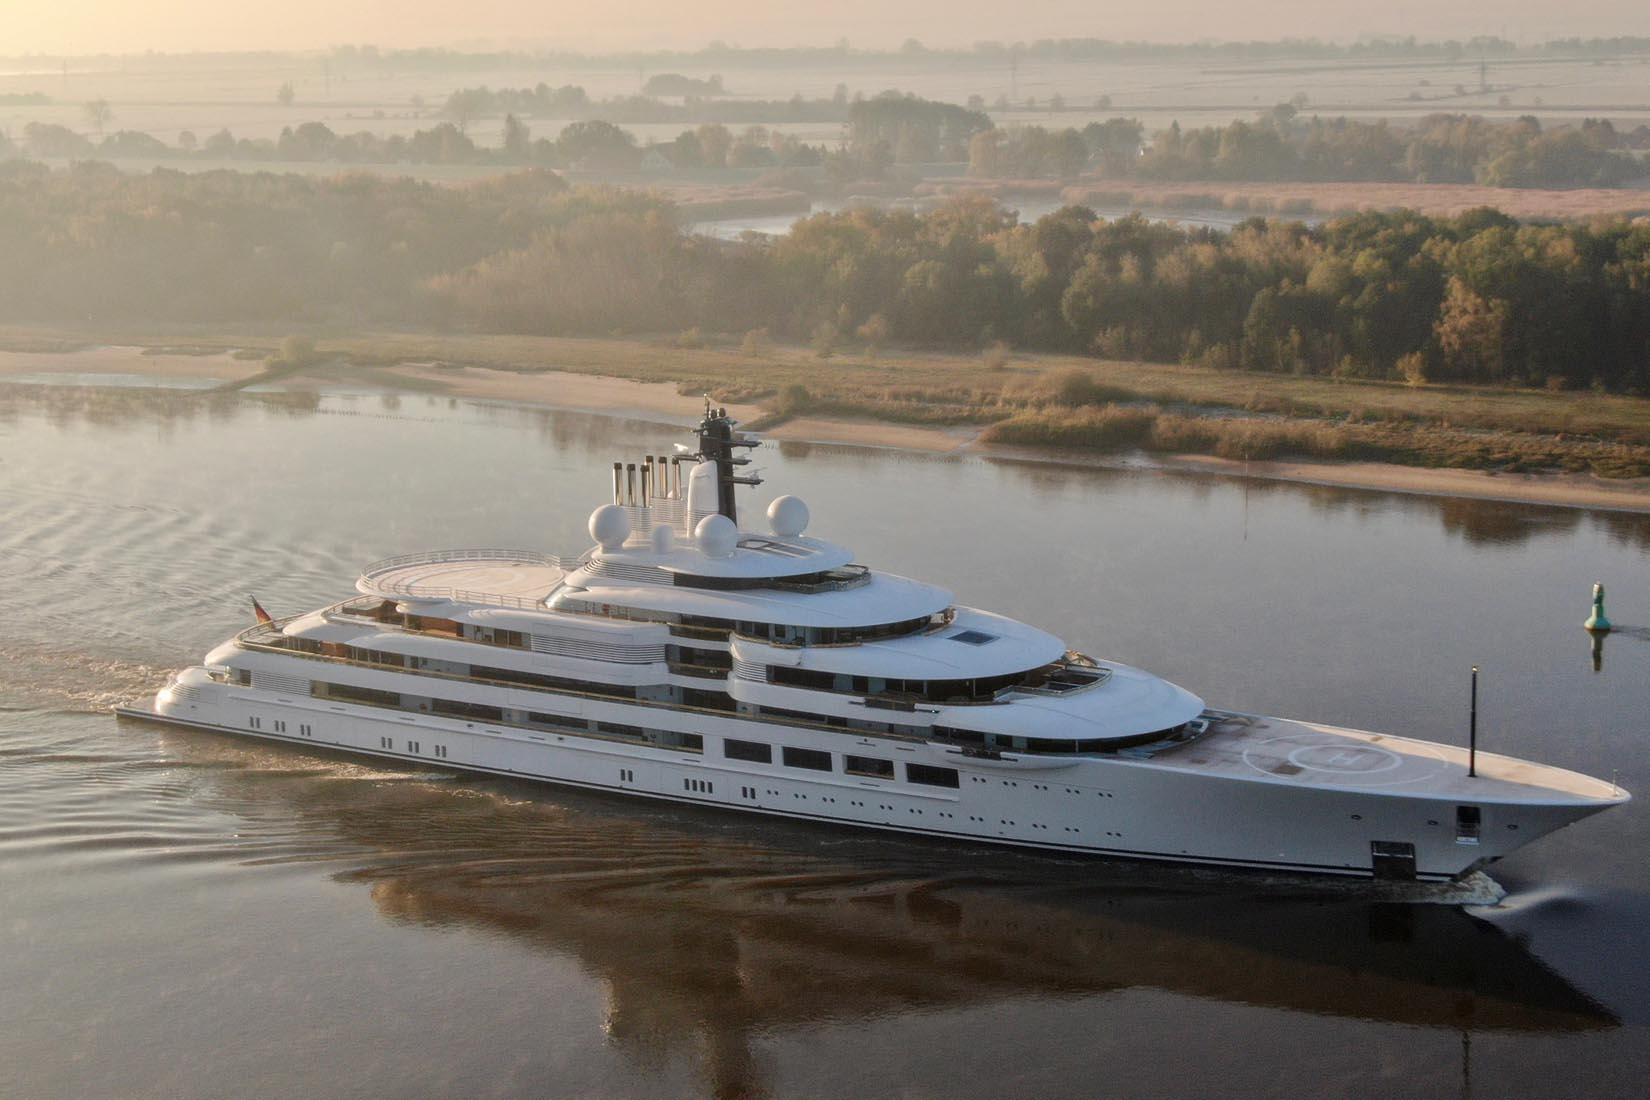 largest yacht scheherazade review Luxe Digital